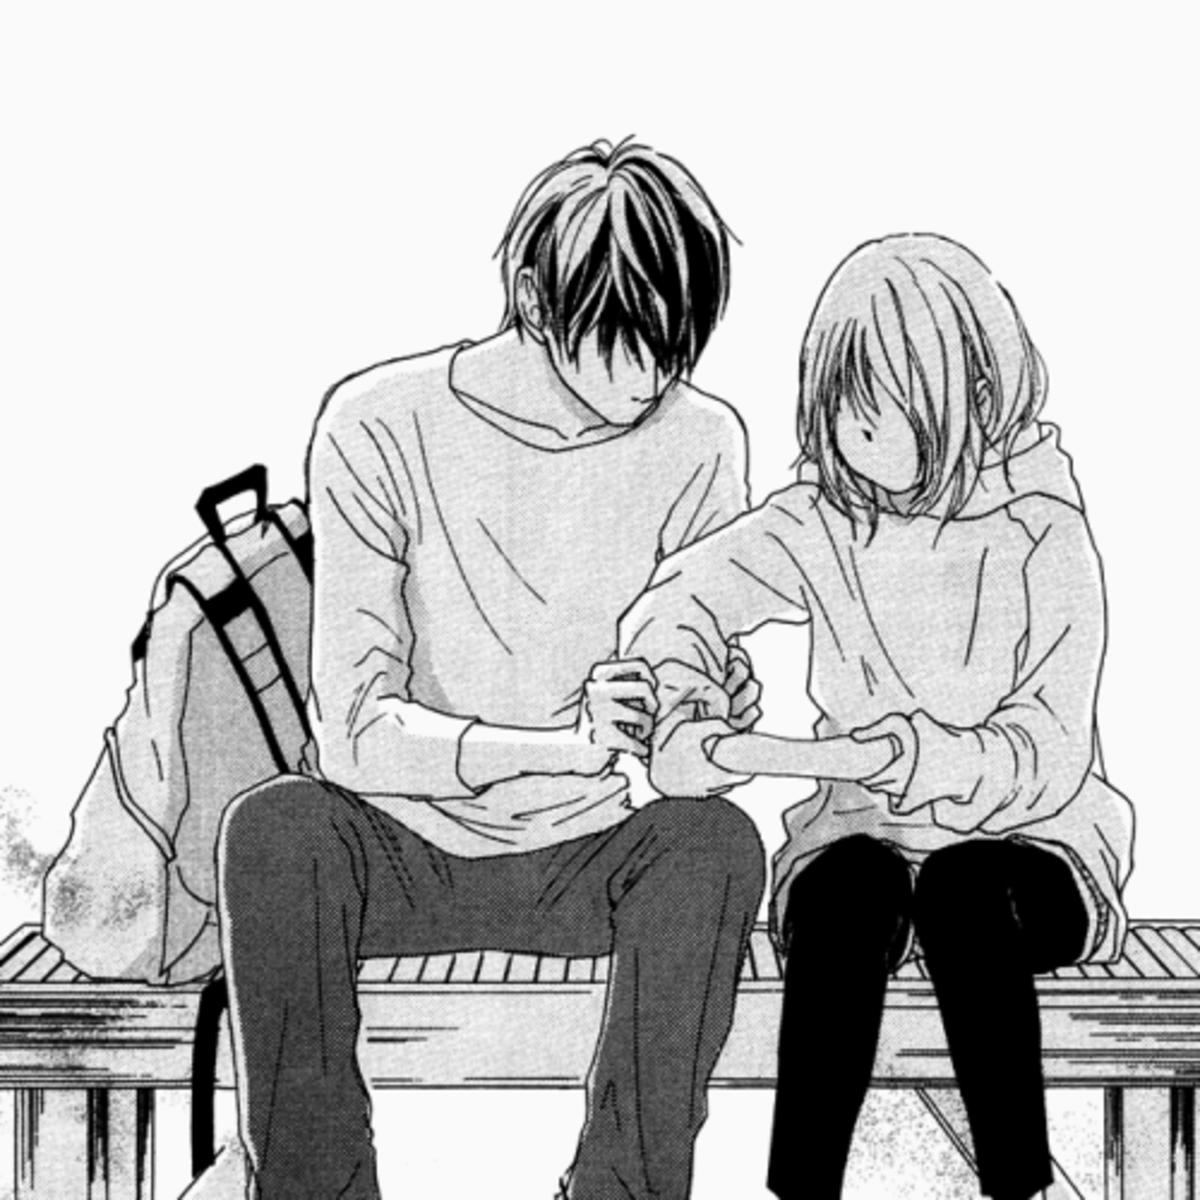 Ren and Ninako